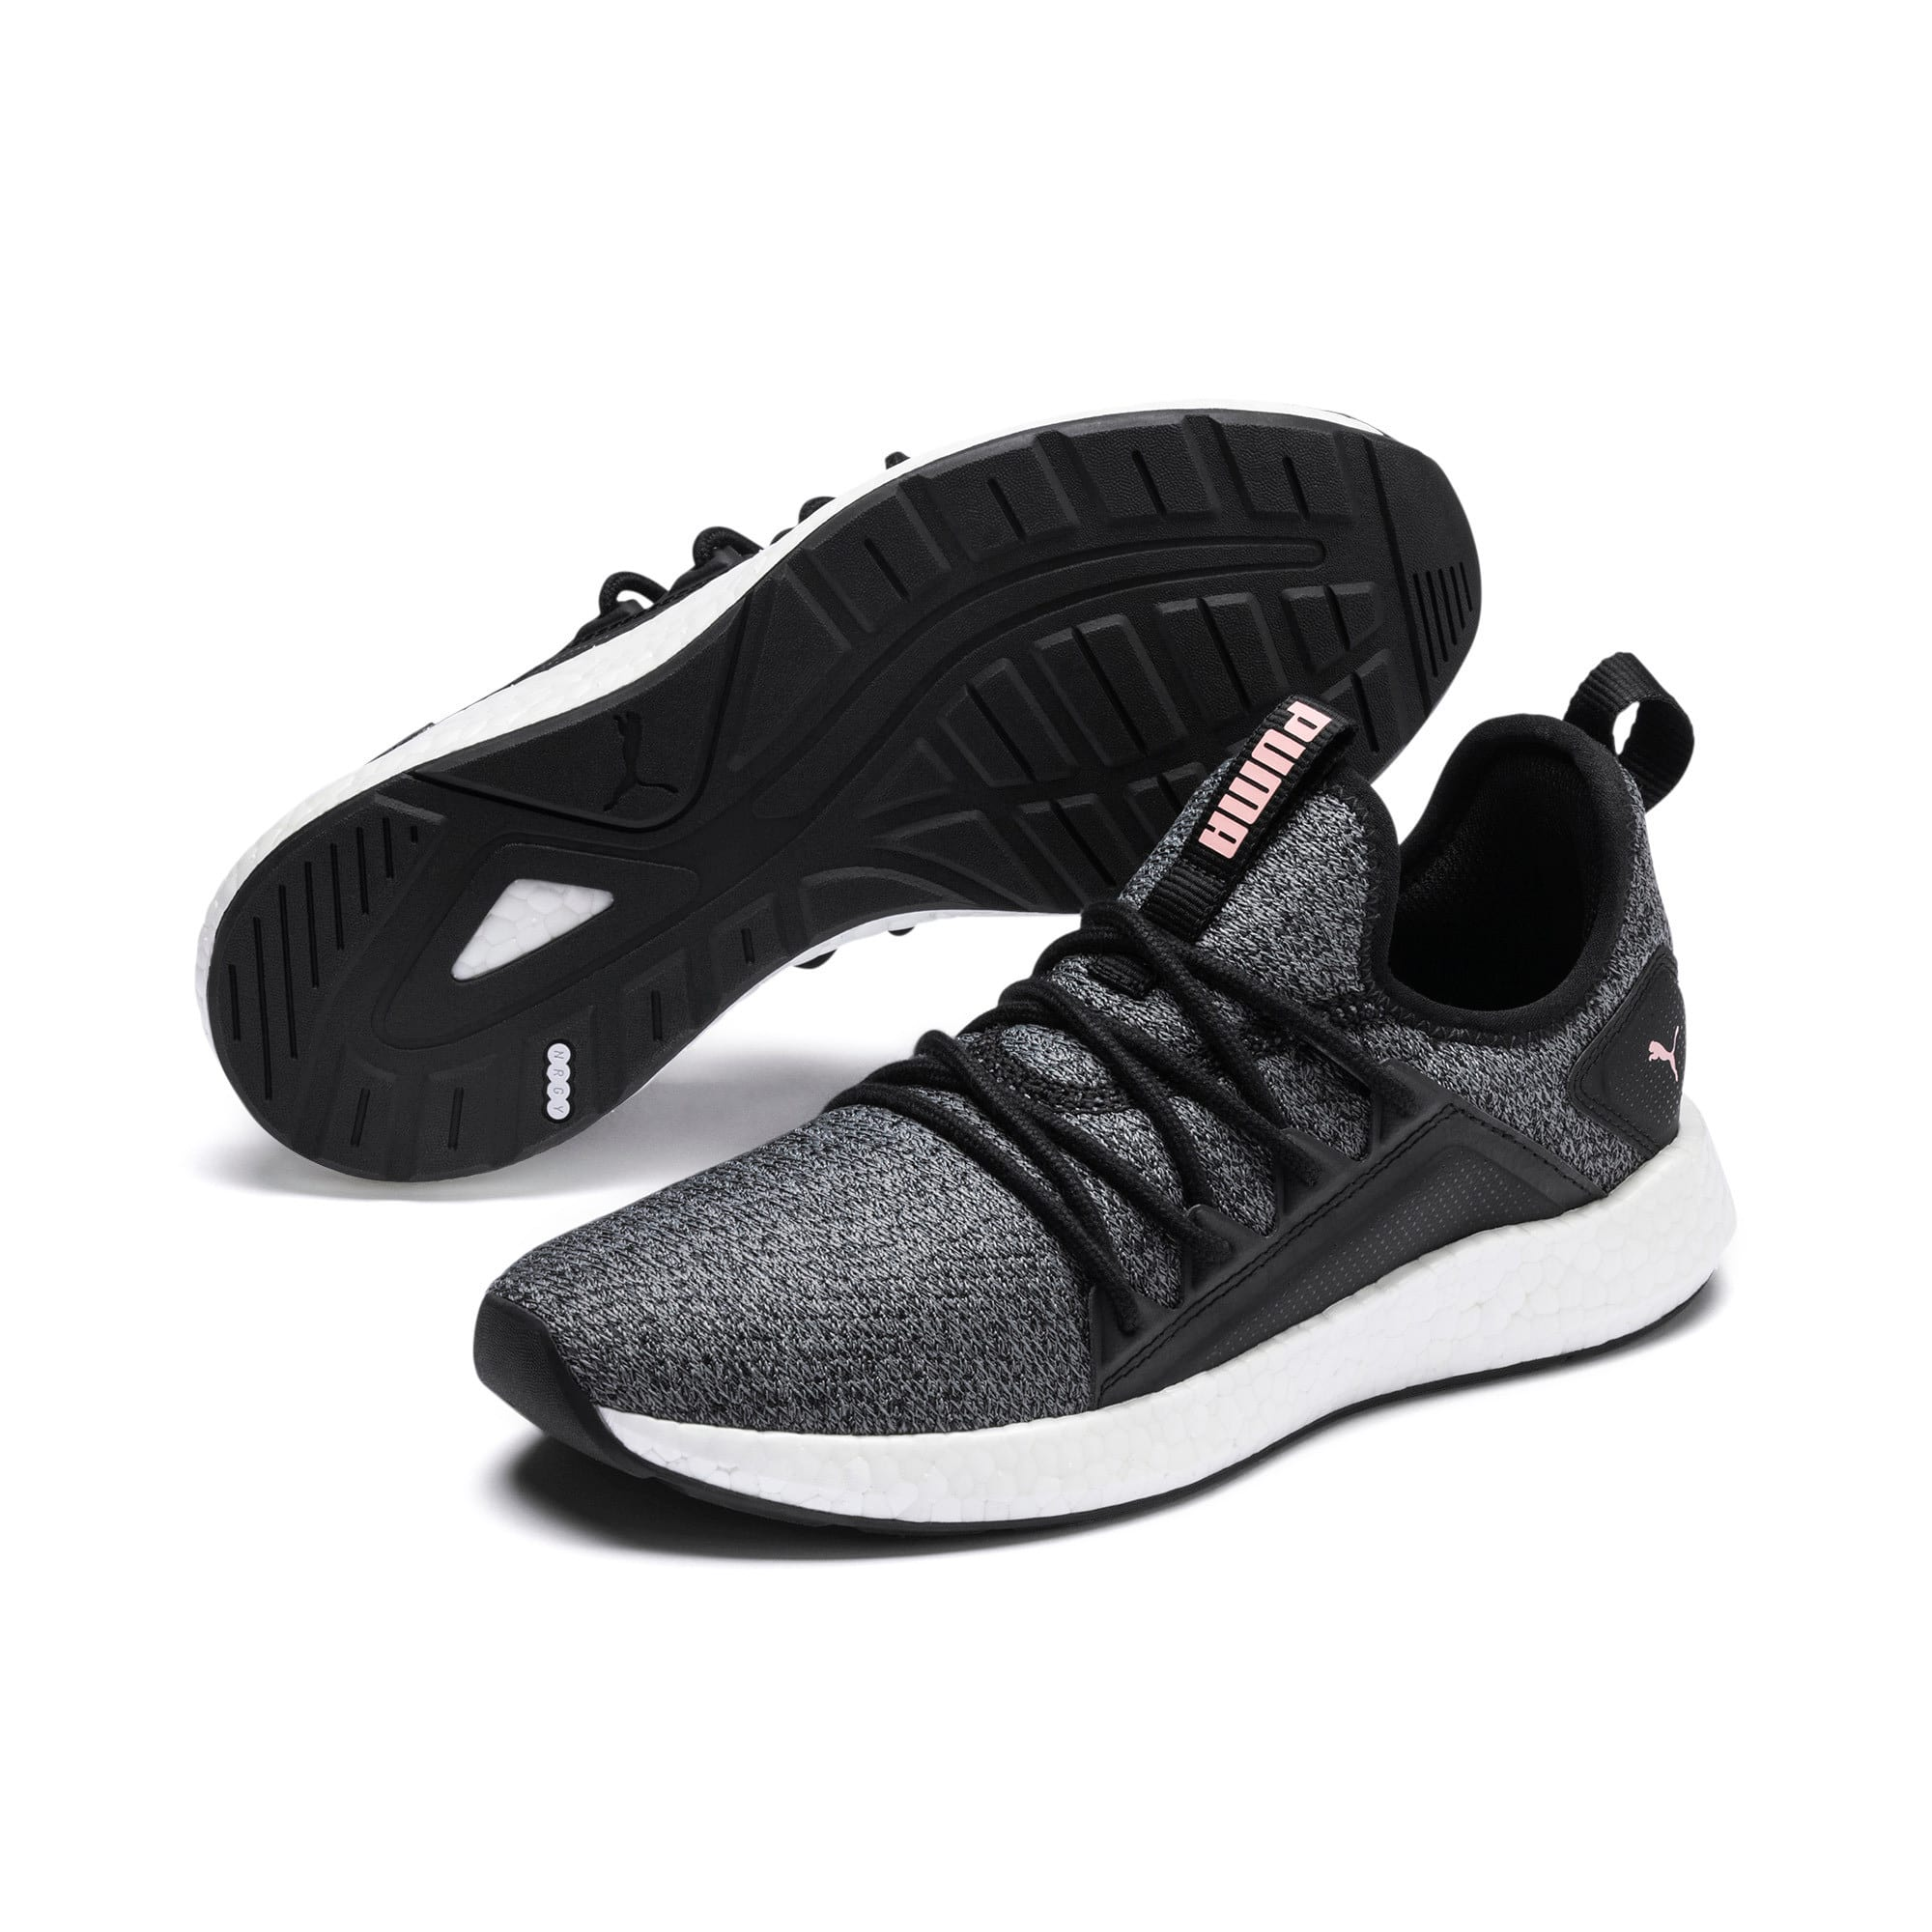 Thumbnail 3 of NRGY Neko Knit Women's Running Shoes, Puma Black-Bridal Rose, medium